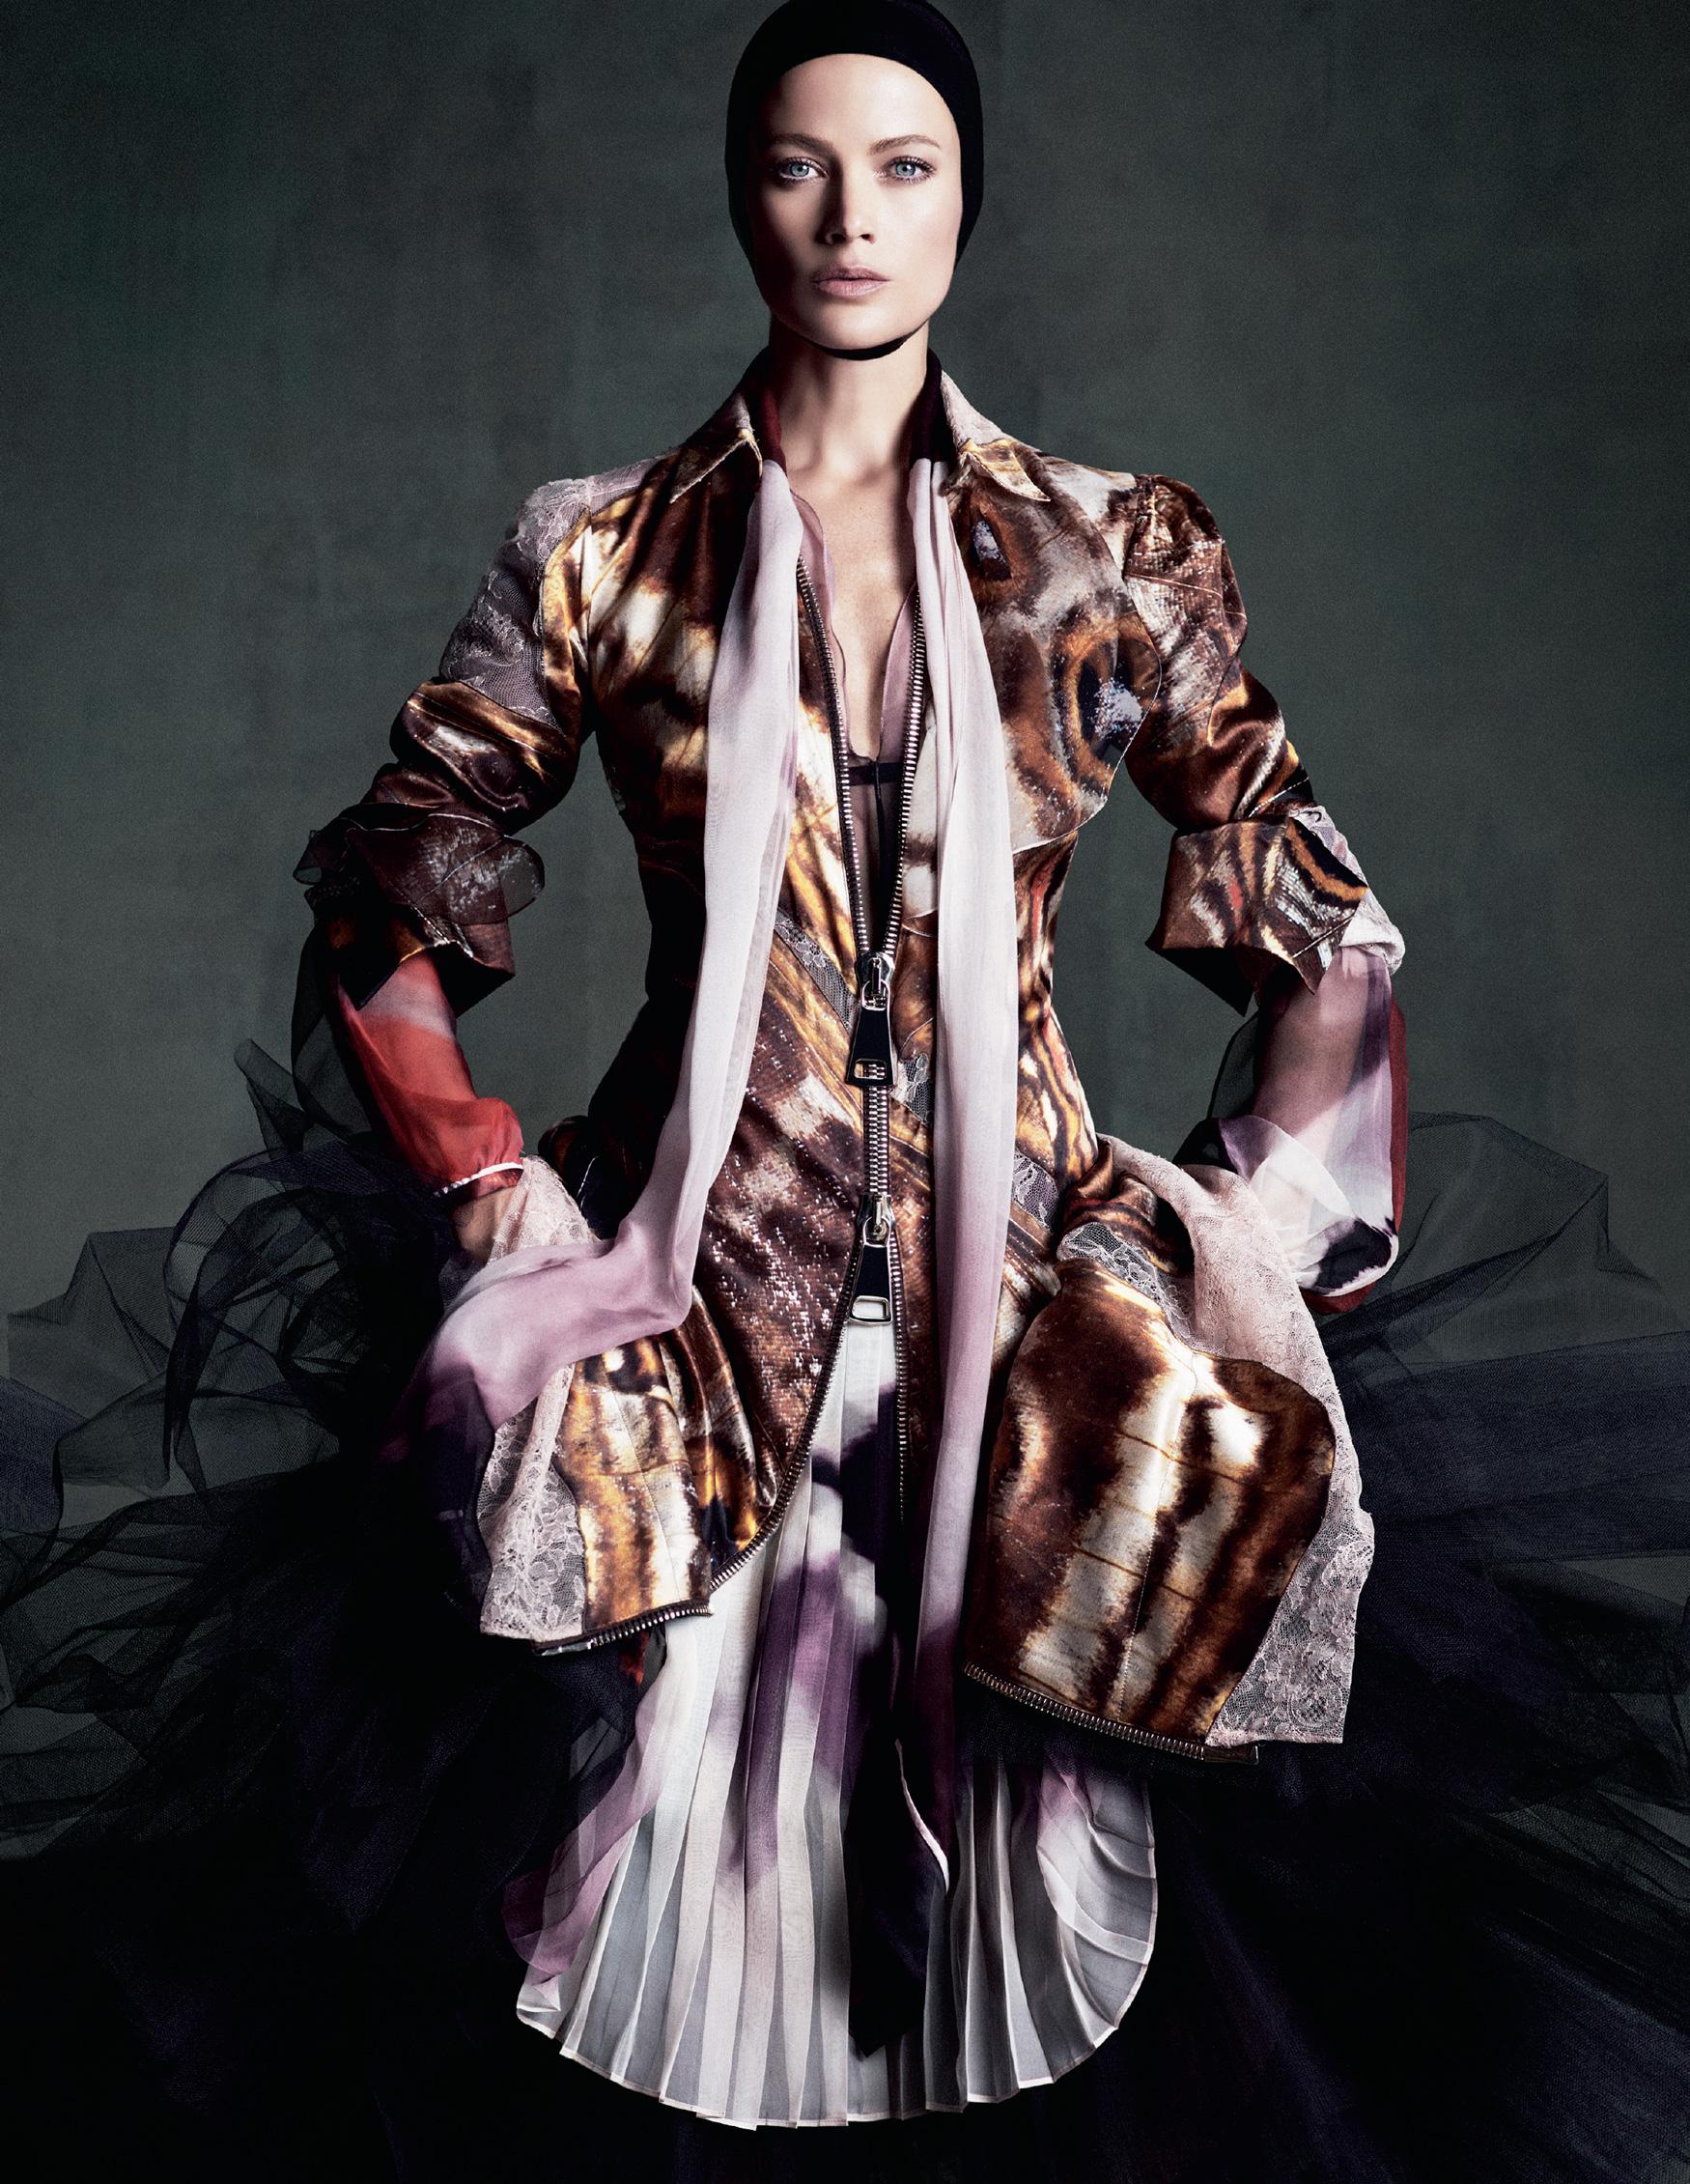 Giovanna-Battaglia-The-Icons-Of-Perfections-Vogue-Japan-15th-Anniversary-Issue-Luigi-Iango-V181_255_200-13.jpg